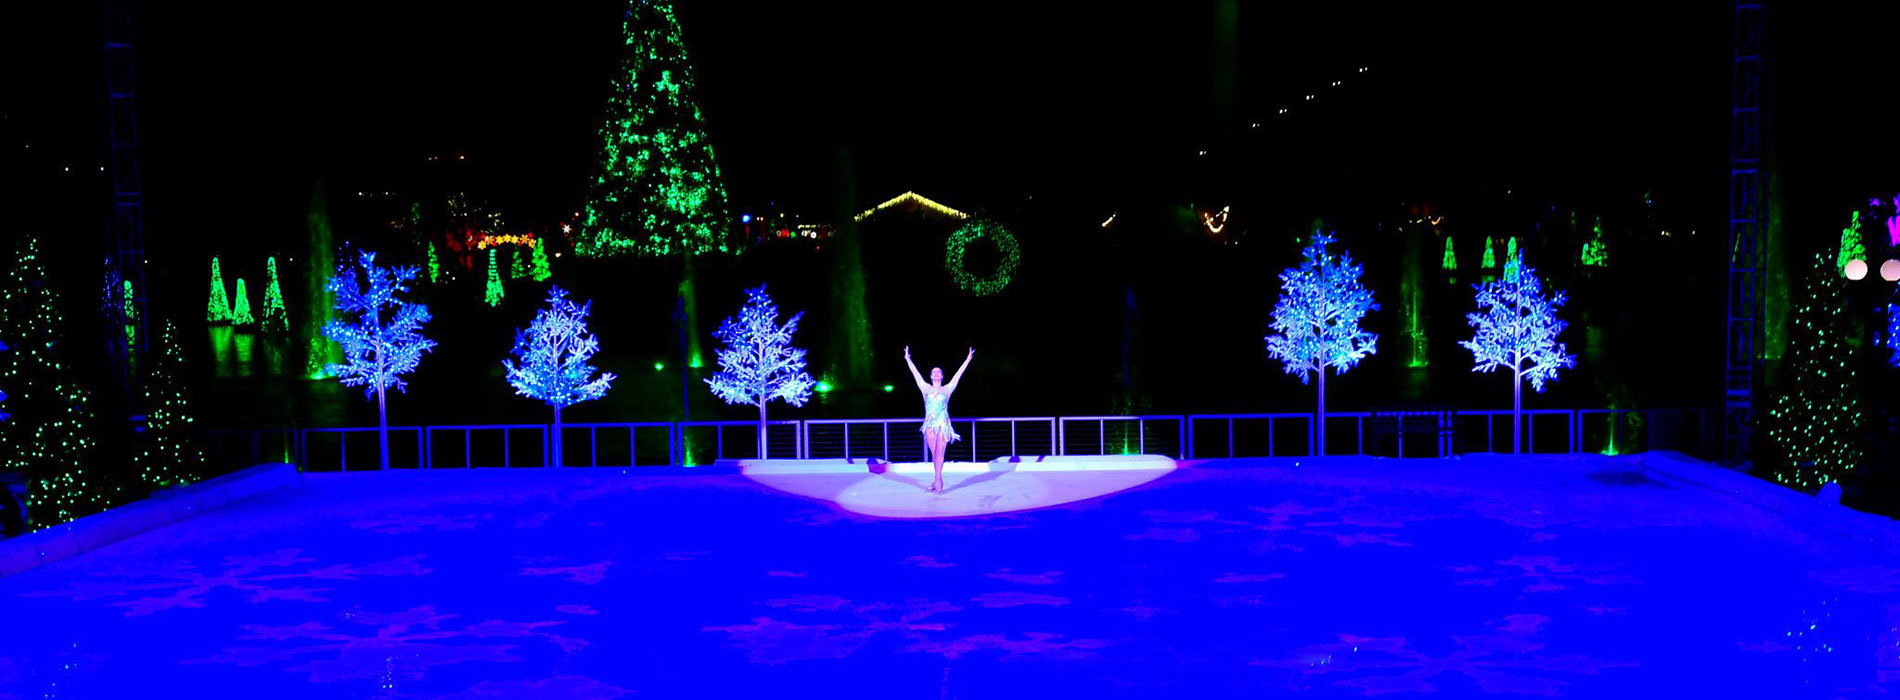 Winter Wonderland on Ice Skater at SeaWorld Orlando